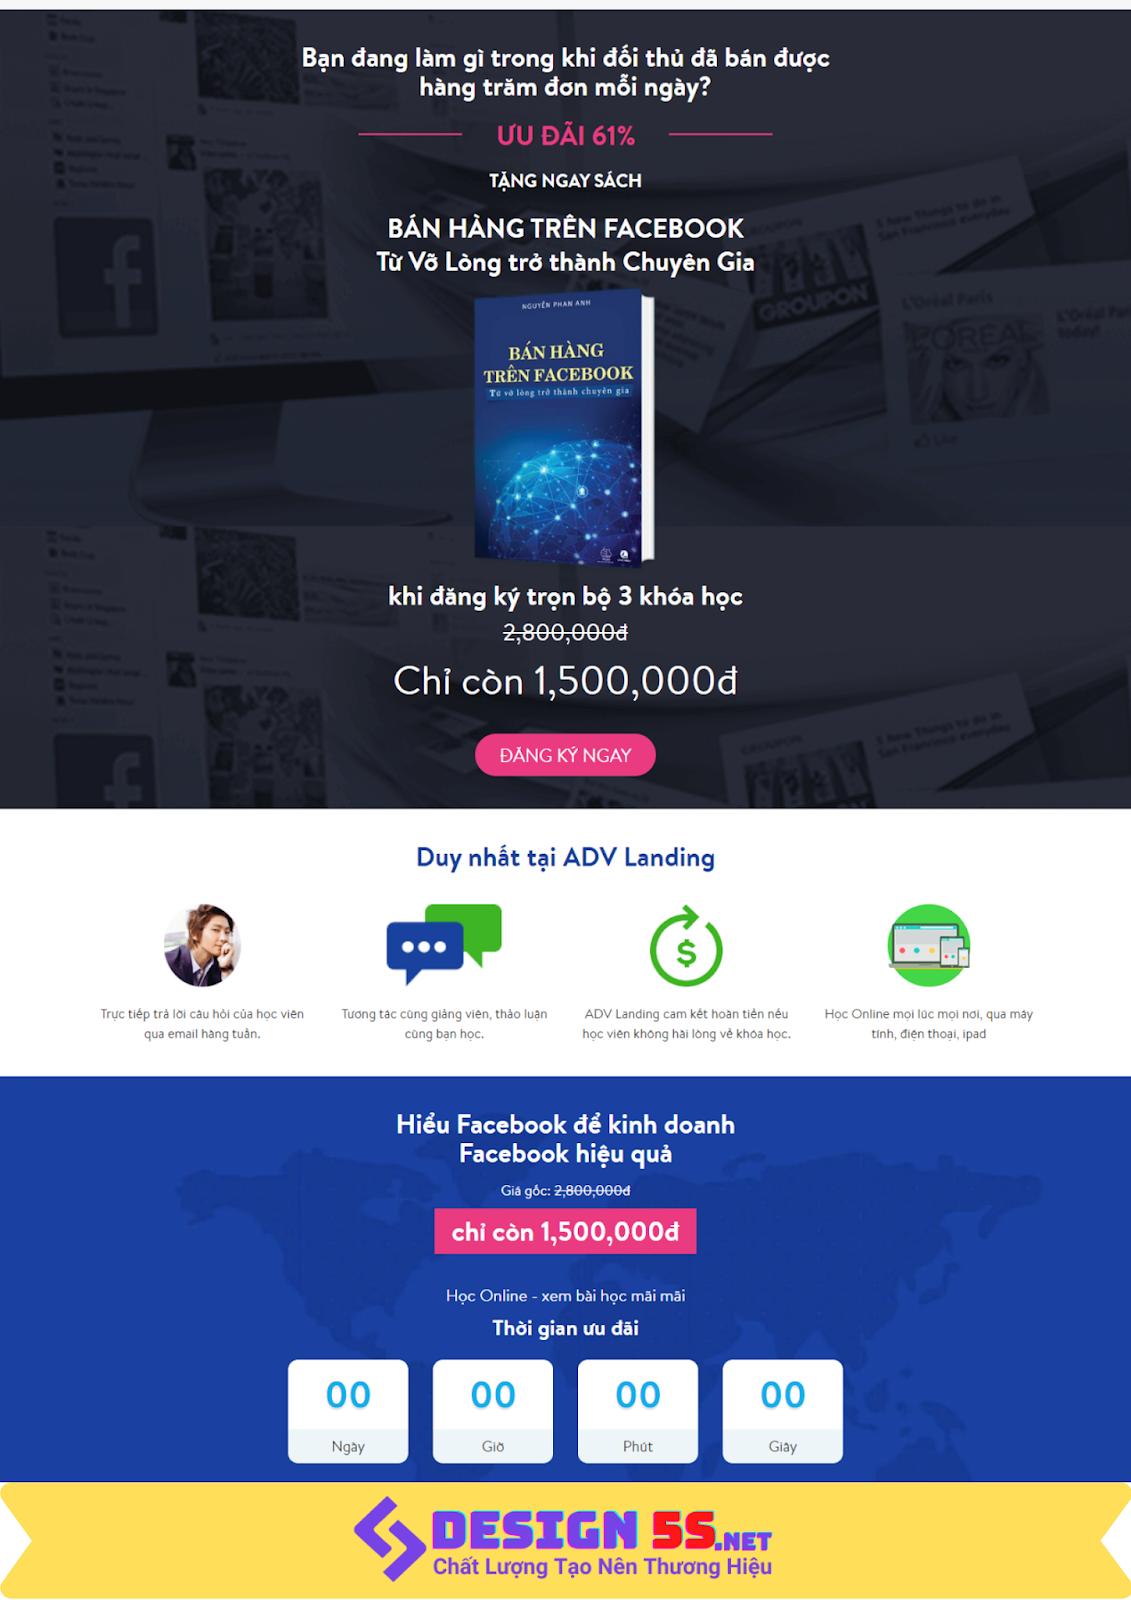 Template blogspot Landing Page Blogspot Dịch vụ cho Facebook VSM50 - Ảnh 2